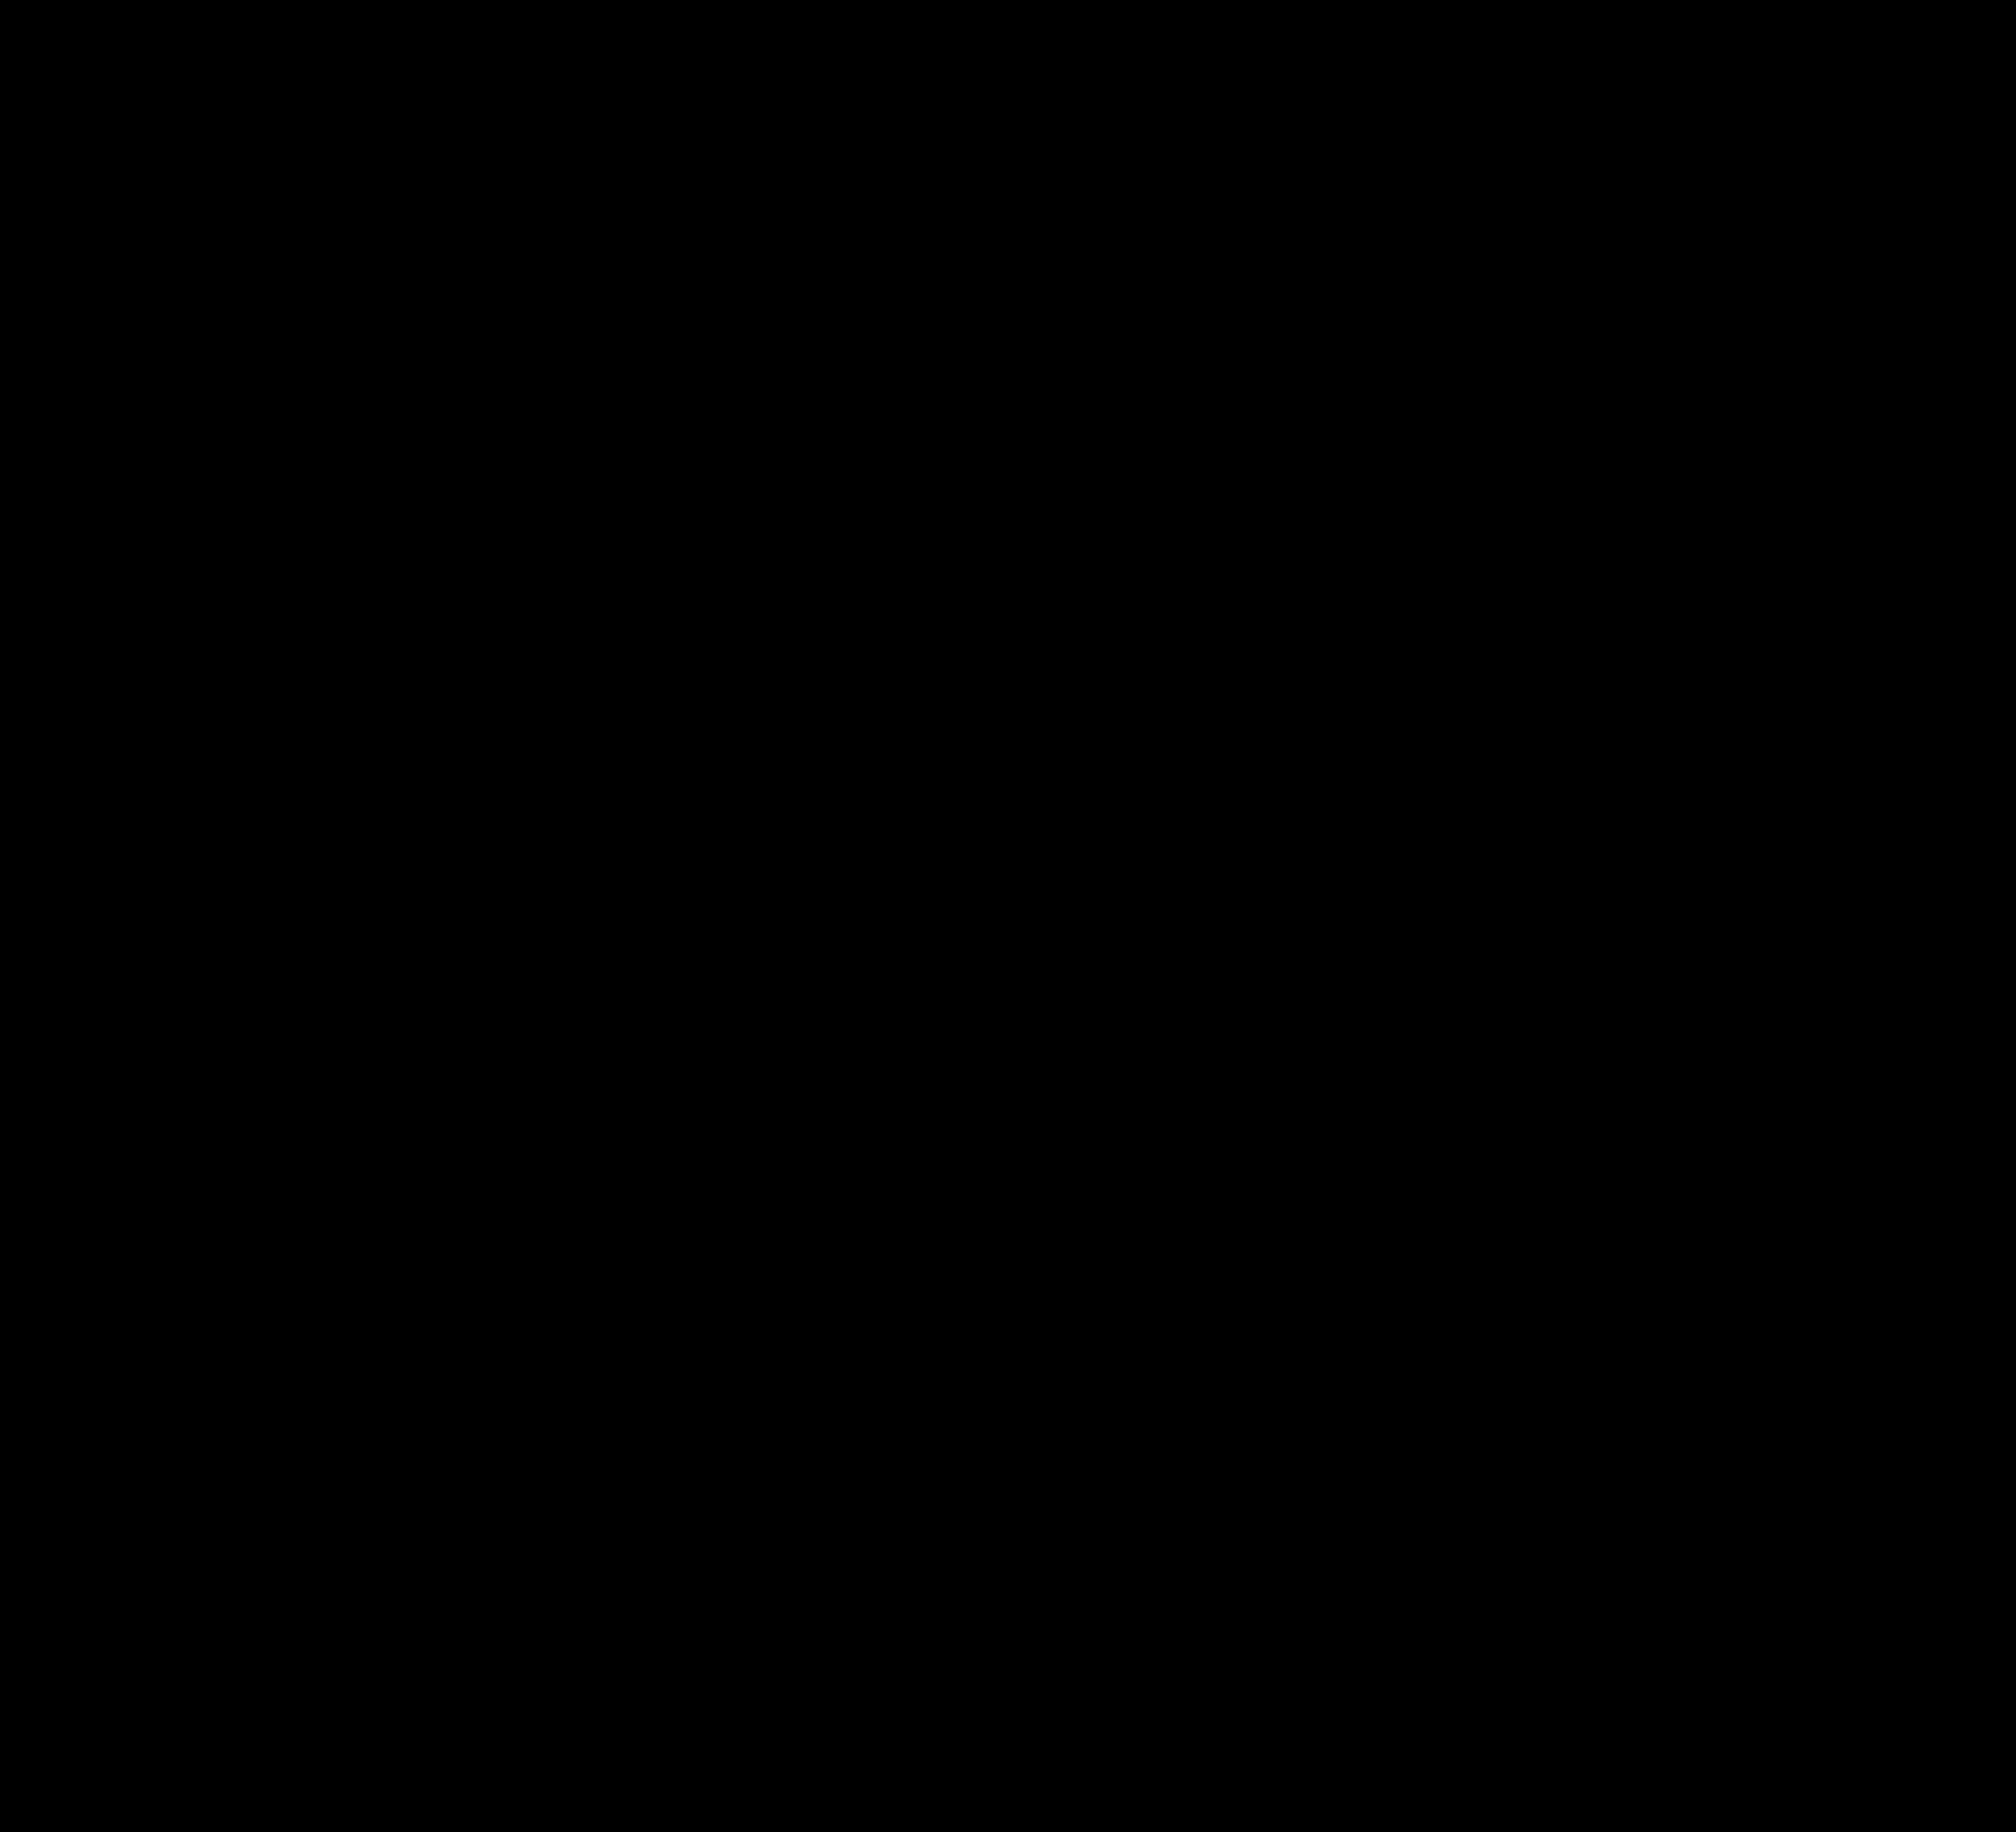 jol_3517-4